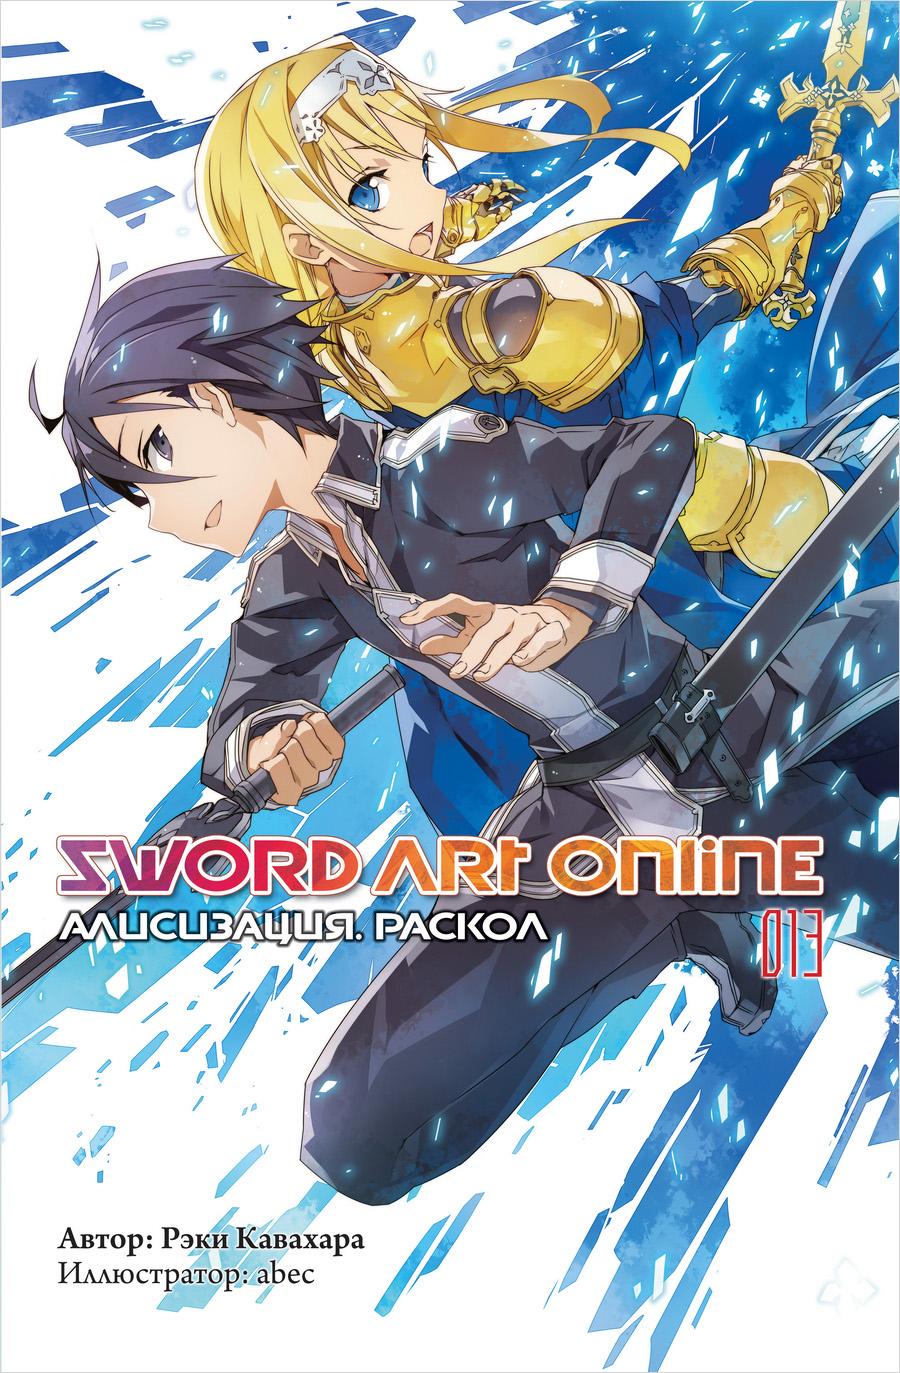 Sword Art Online: Алисизация – Раскол. 013 фото